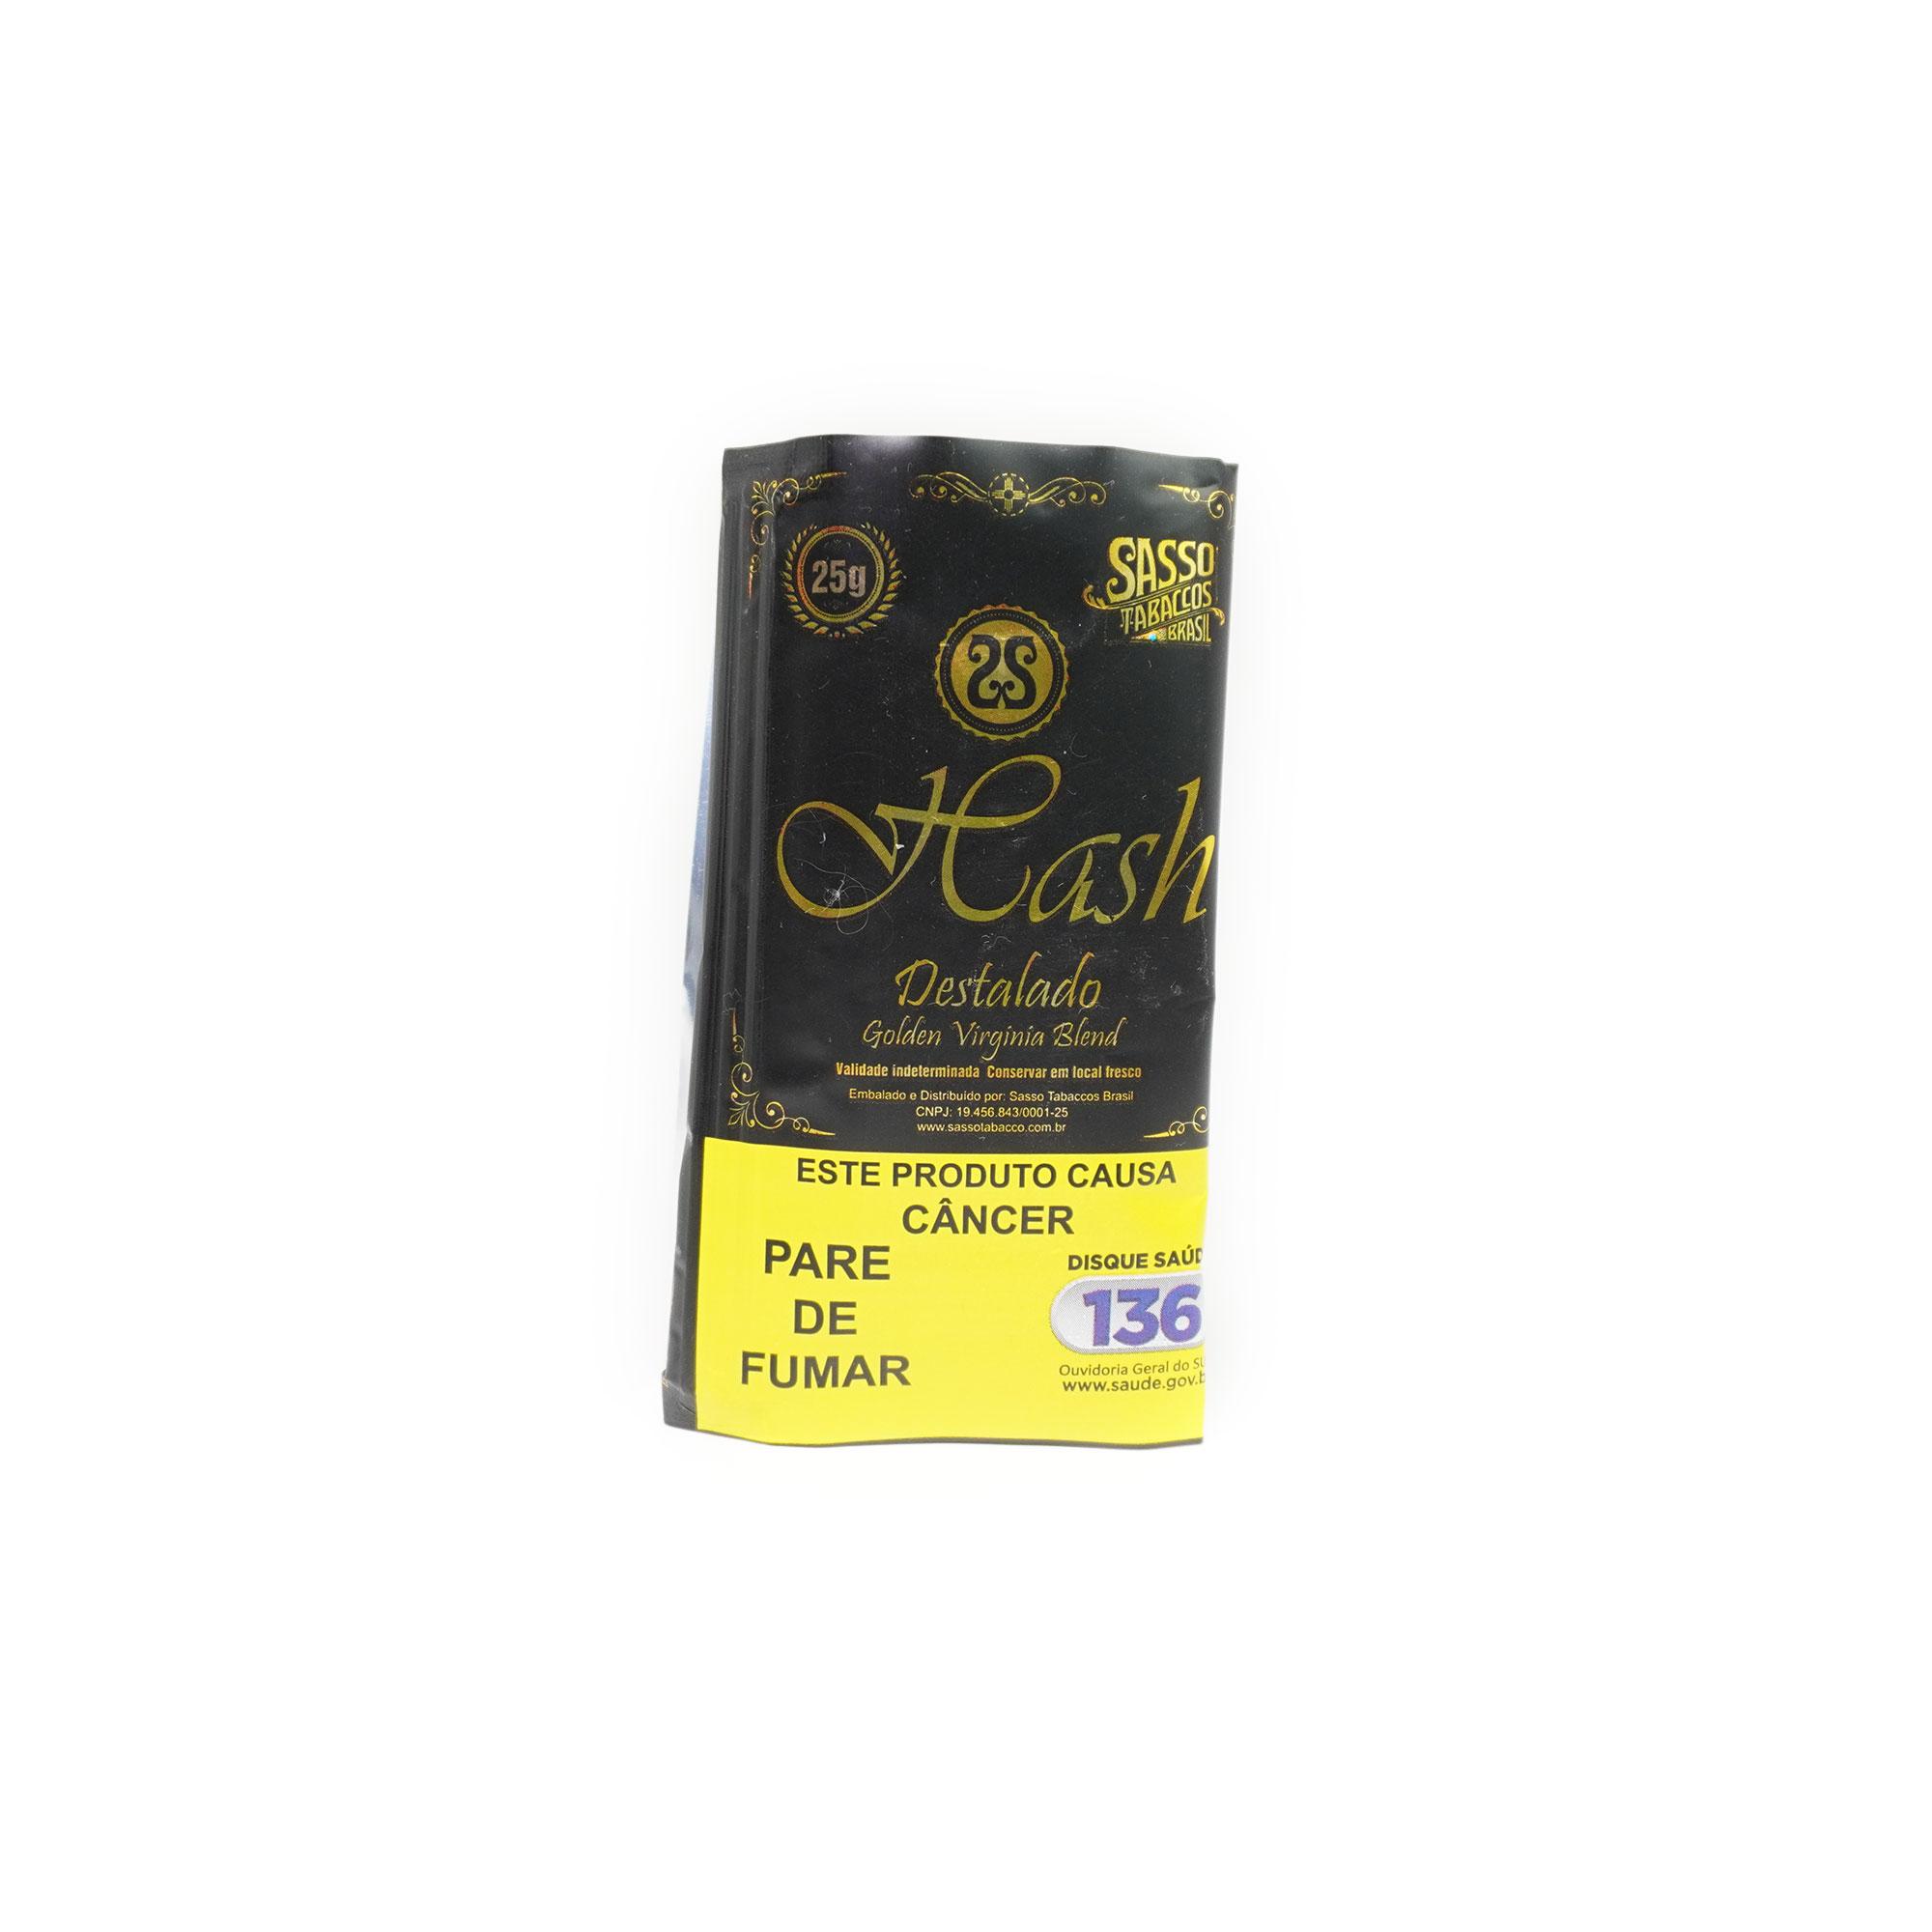 Tabaco Sasso Hash 25g